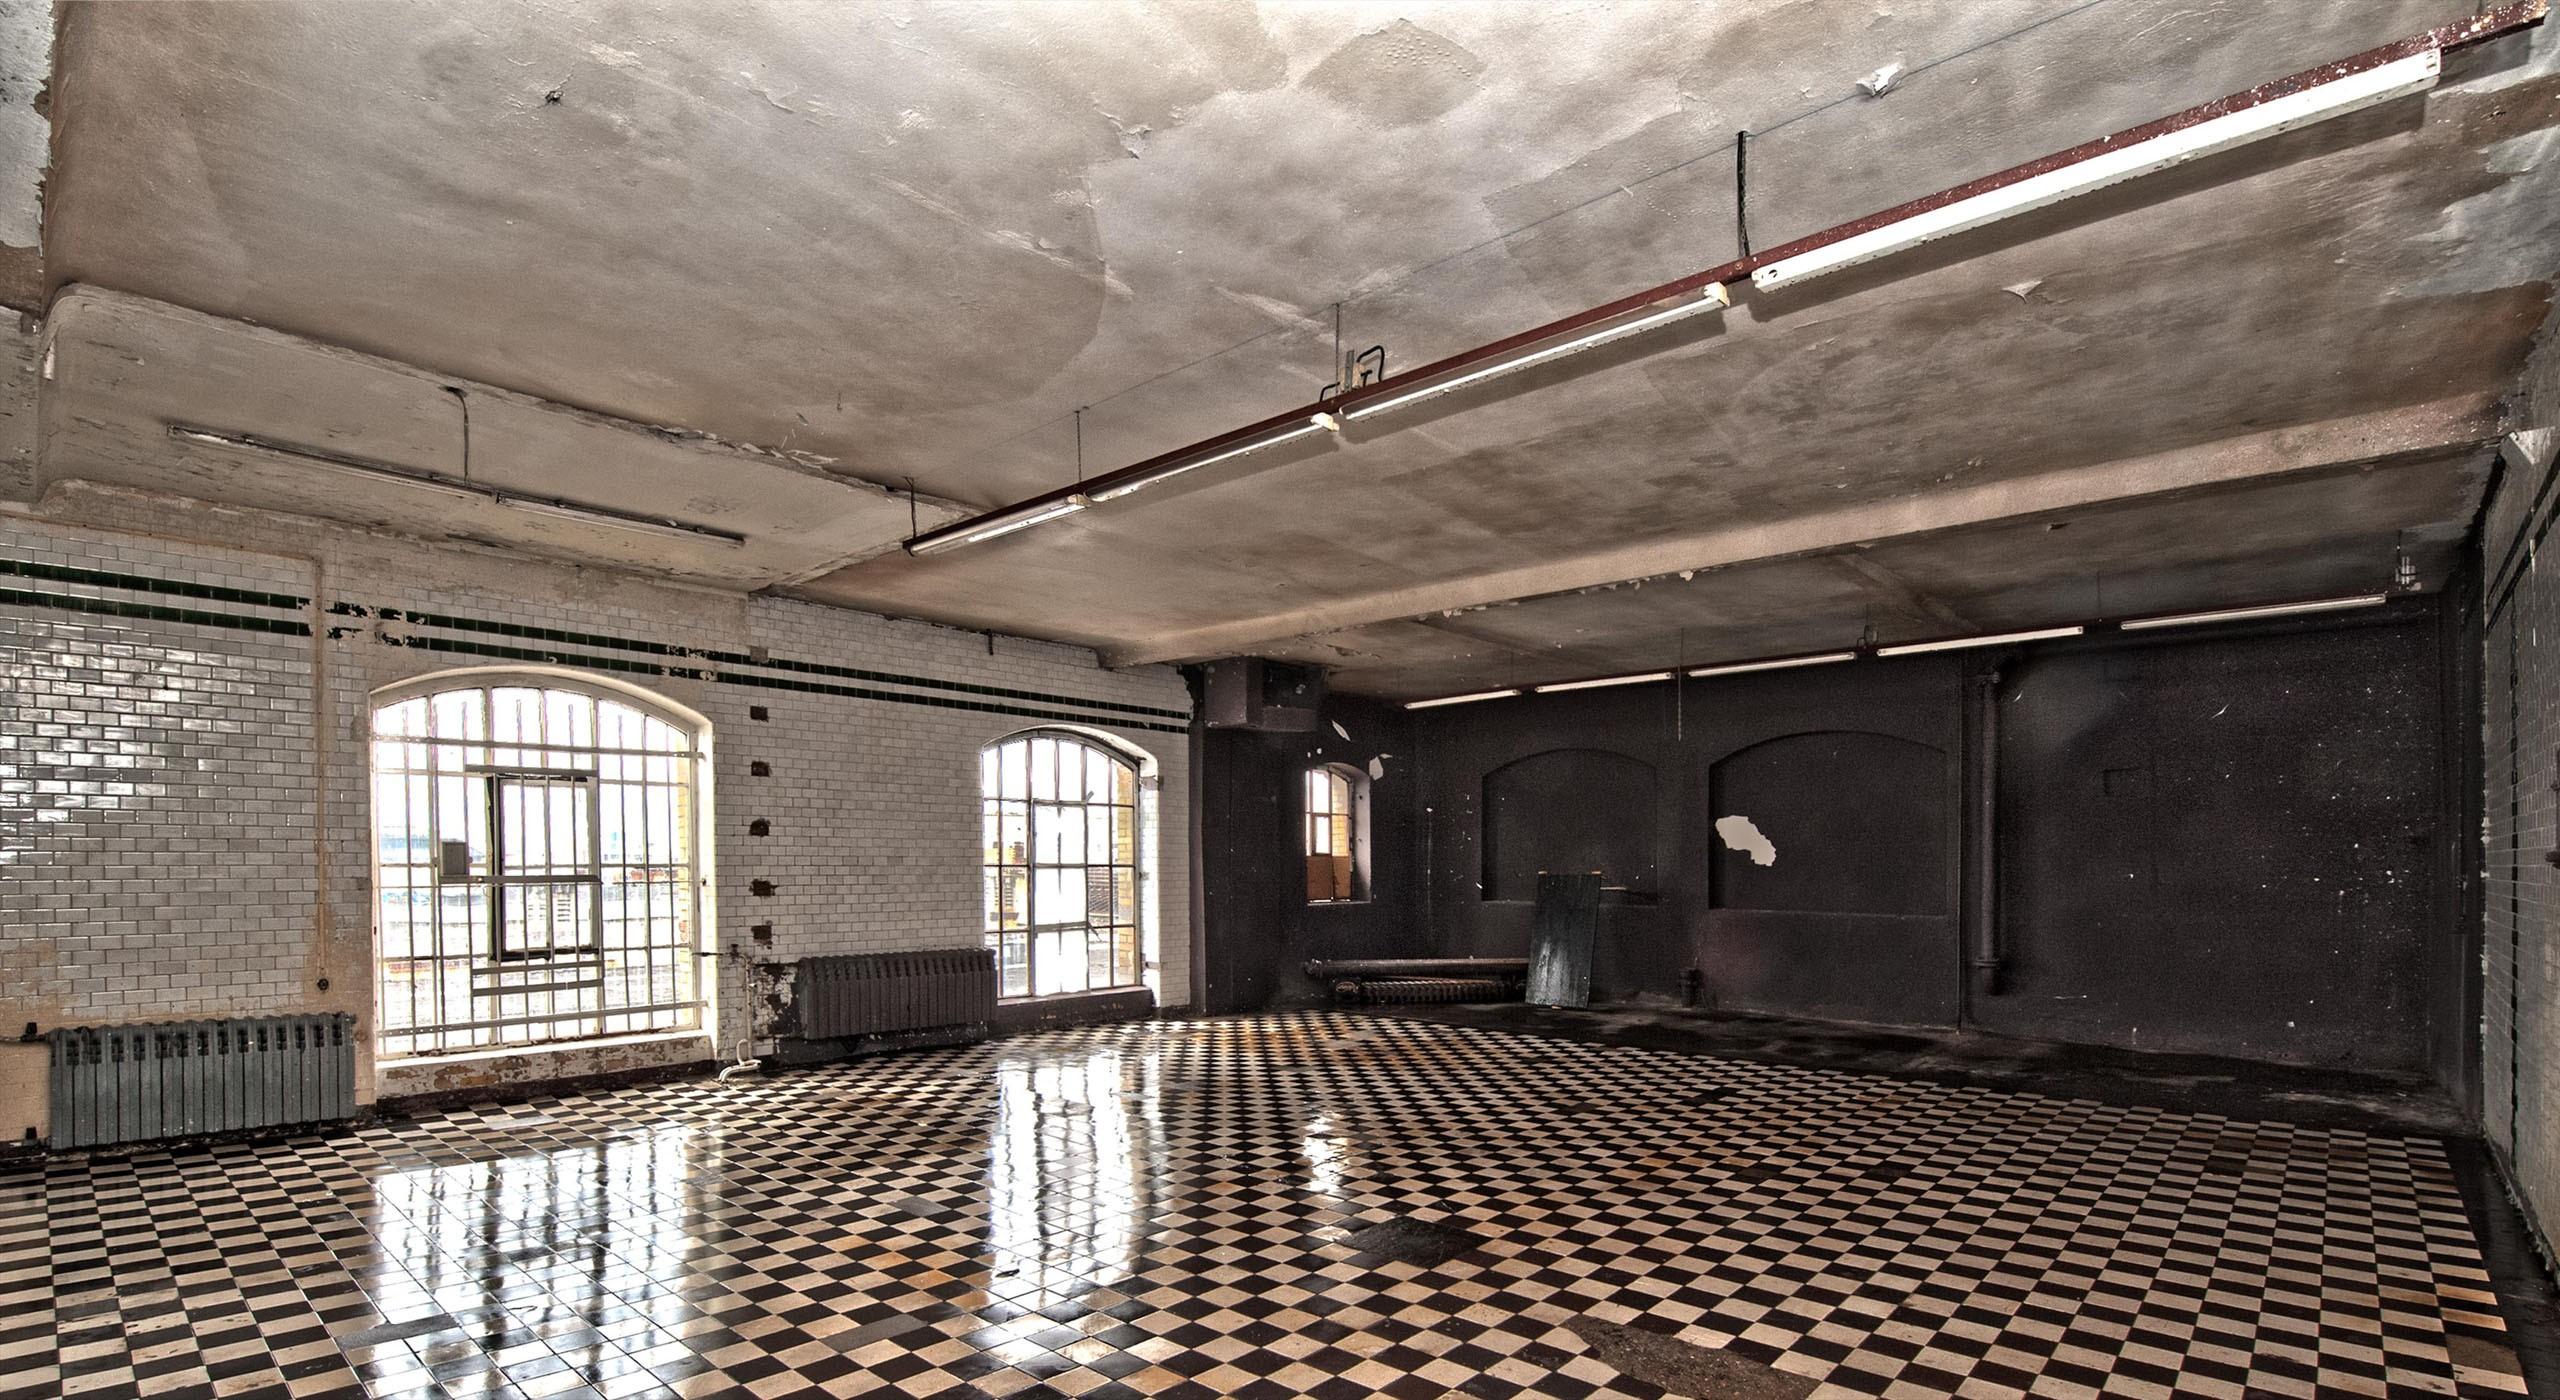 Innenansicht der ehemaligen Bötzow-Brauerei Berlin während Sanierung © Bernd Blumrich